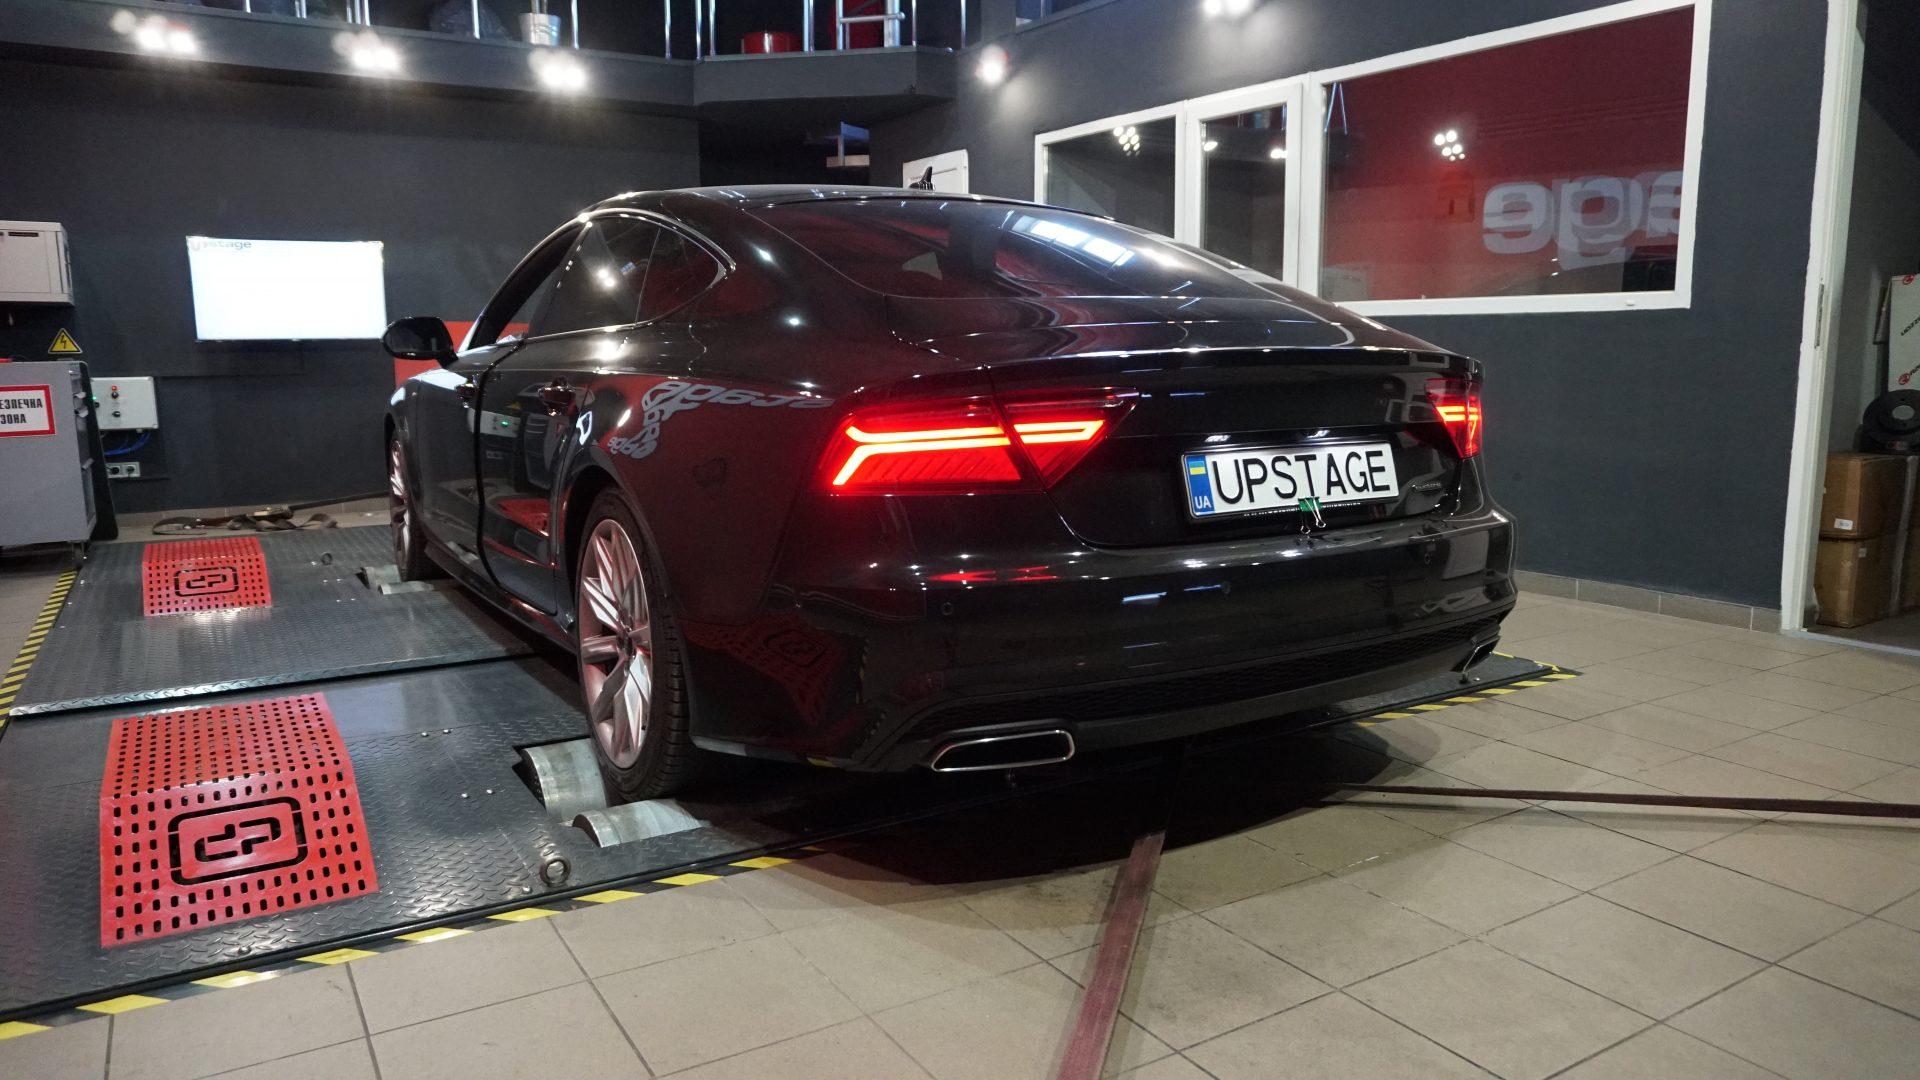 чип тюнинг Audi A7 3.0 TDI Biturbo